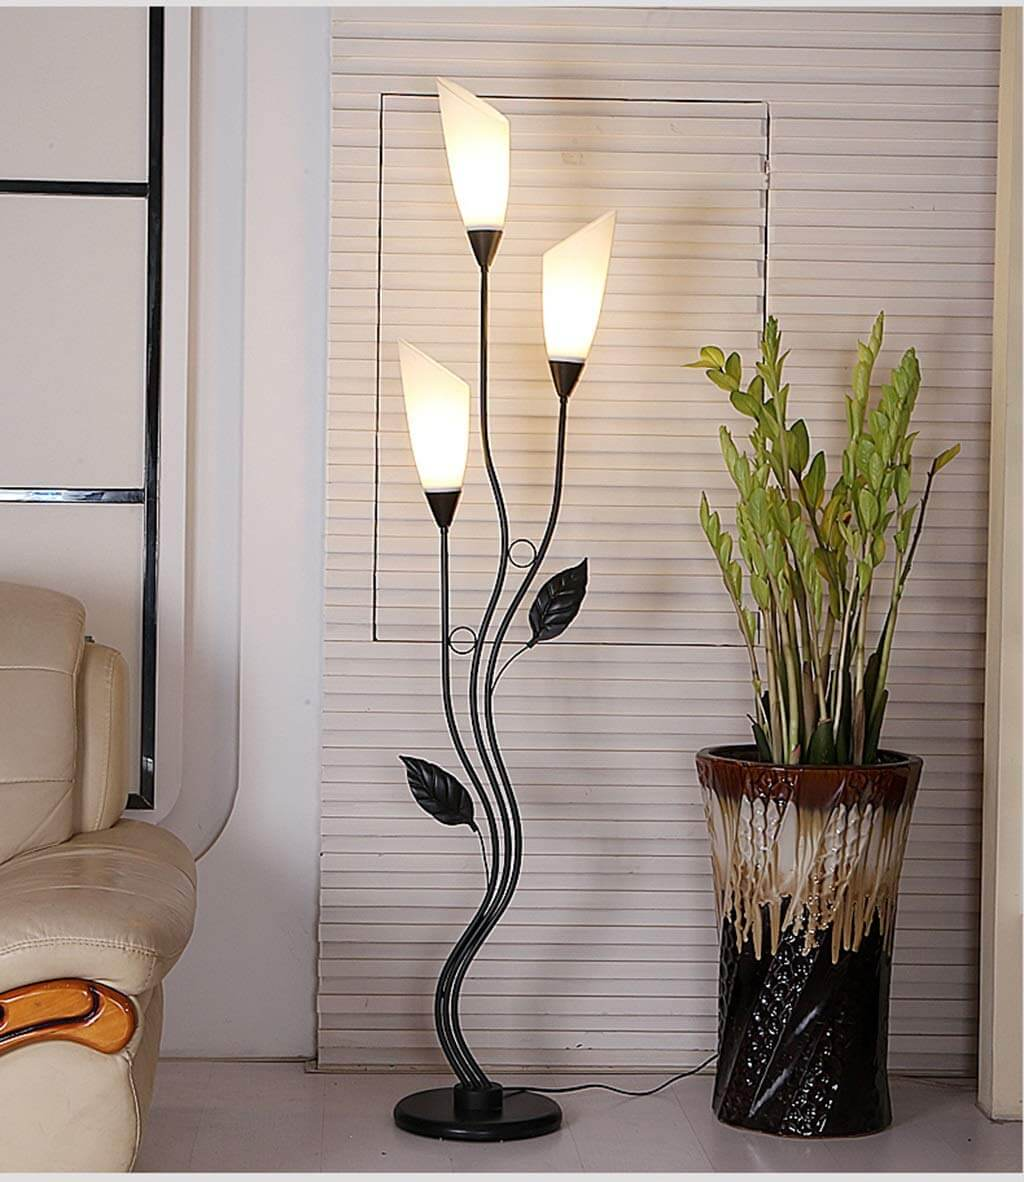 29 Best Living Room Wall Lamps For Trendy Lighting In 2020